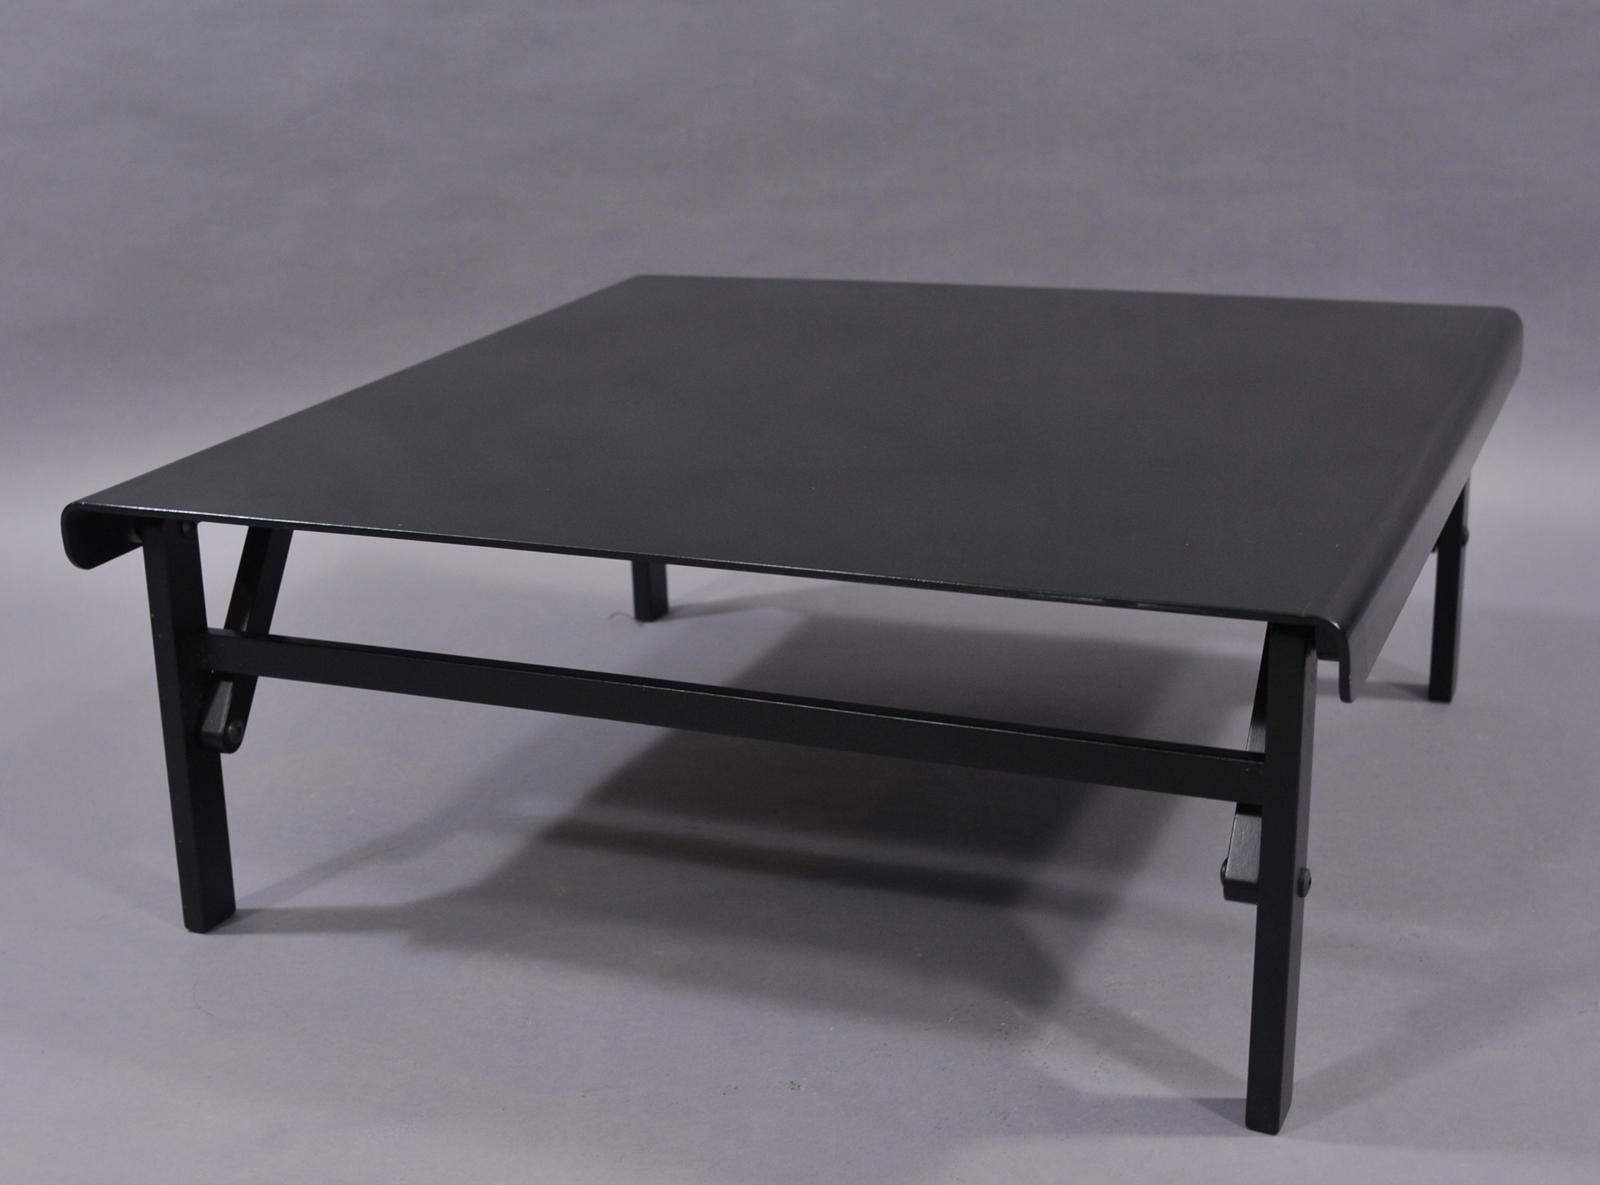 table basse en c ramique ann es 70 modulolab. Black Bedroom Furniture Sets. Home Design Ideas